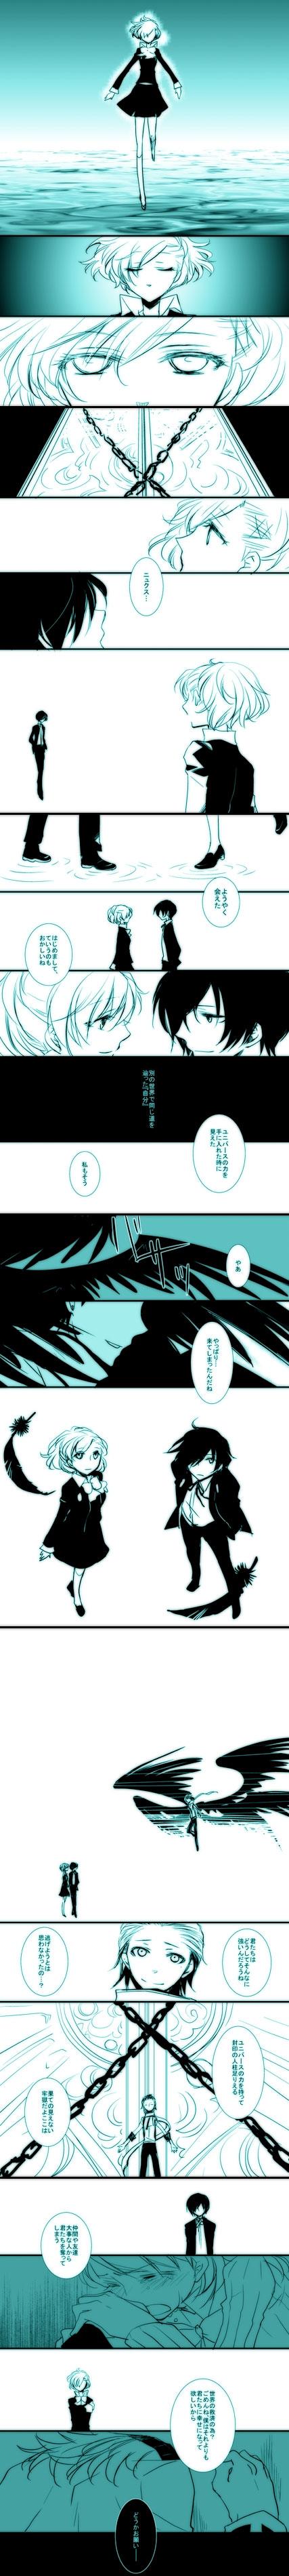 Tags: Anime, Tojo, Persona 3 Portable, Shin Megami Tensei: PERSONA 3, Aragaki Shinjirou, Female Protagonist (PERSONA 3), Takeba Yukari, Mochizuki Ryoji, Yuuki Makoto (PERSONA 3), Sad Comic, Comic, Translated